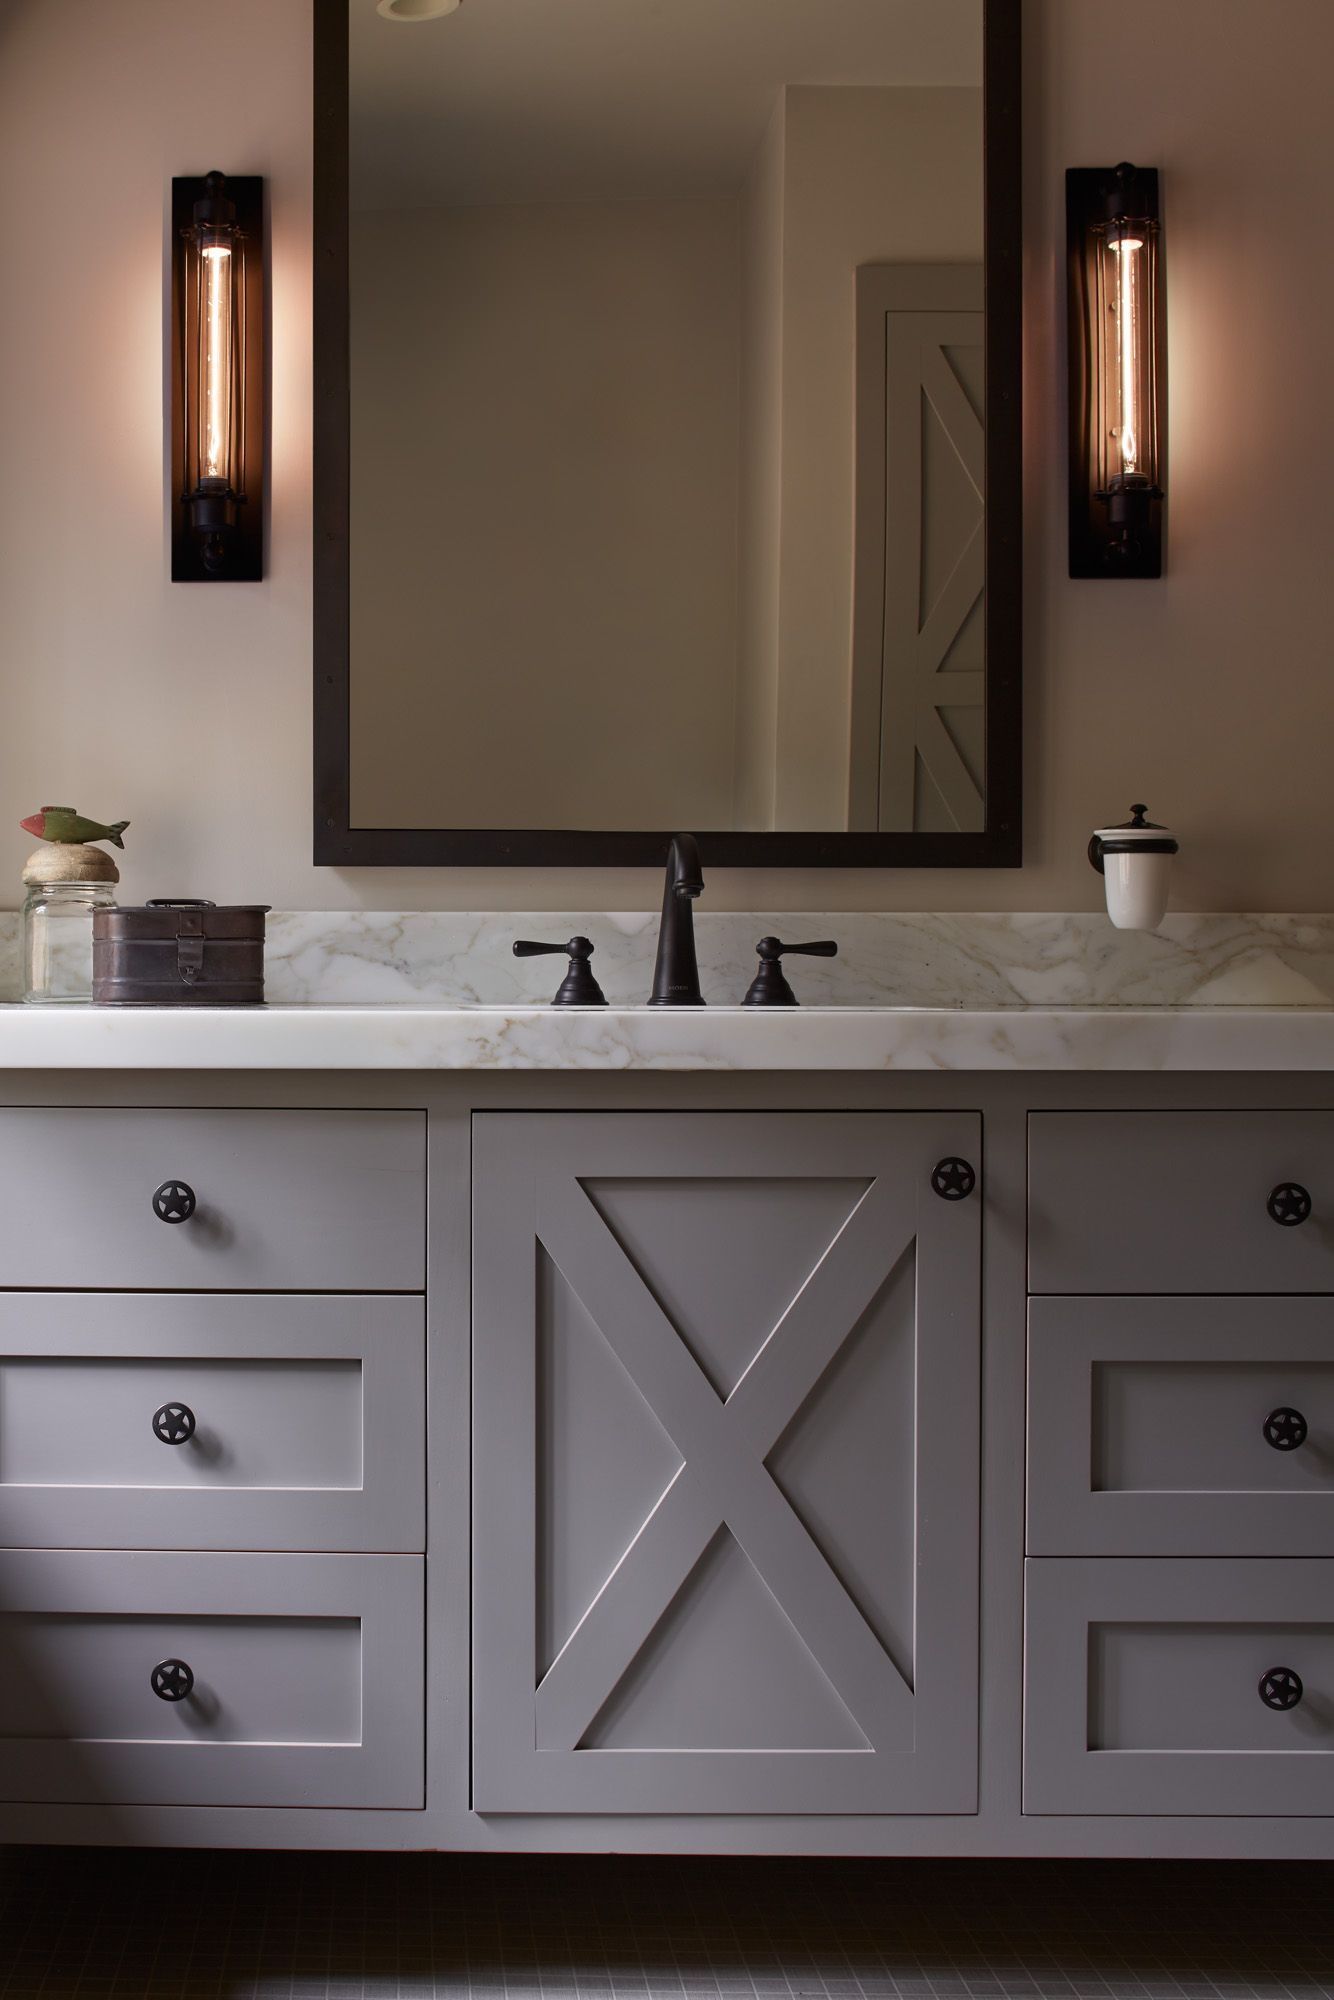 Simple clean lines cabinetry dark plumbing fixtures color adl